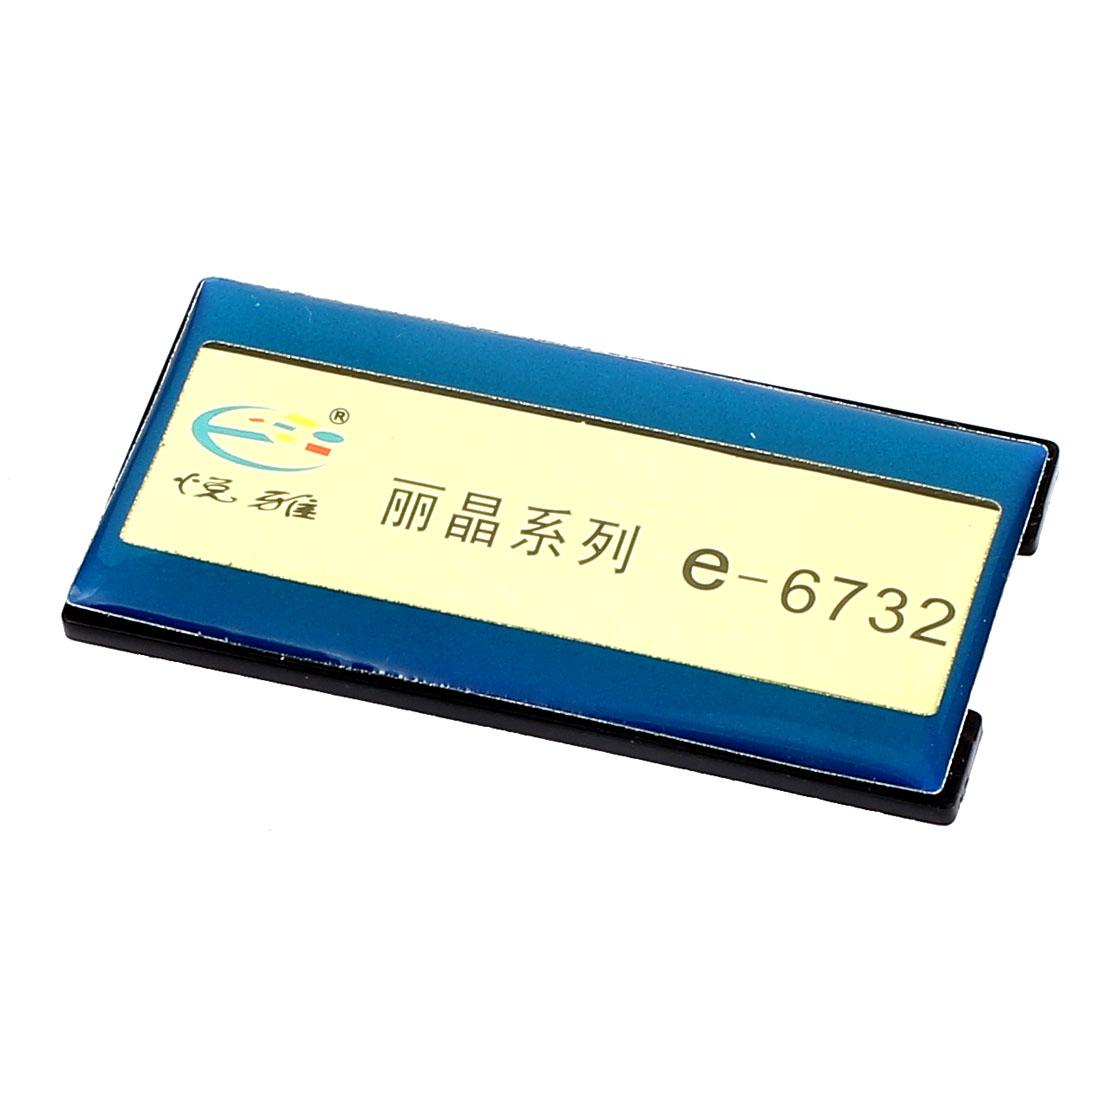 Blue Plastic Horizontal Business Name Tag Clip Safetypin Holder